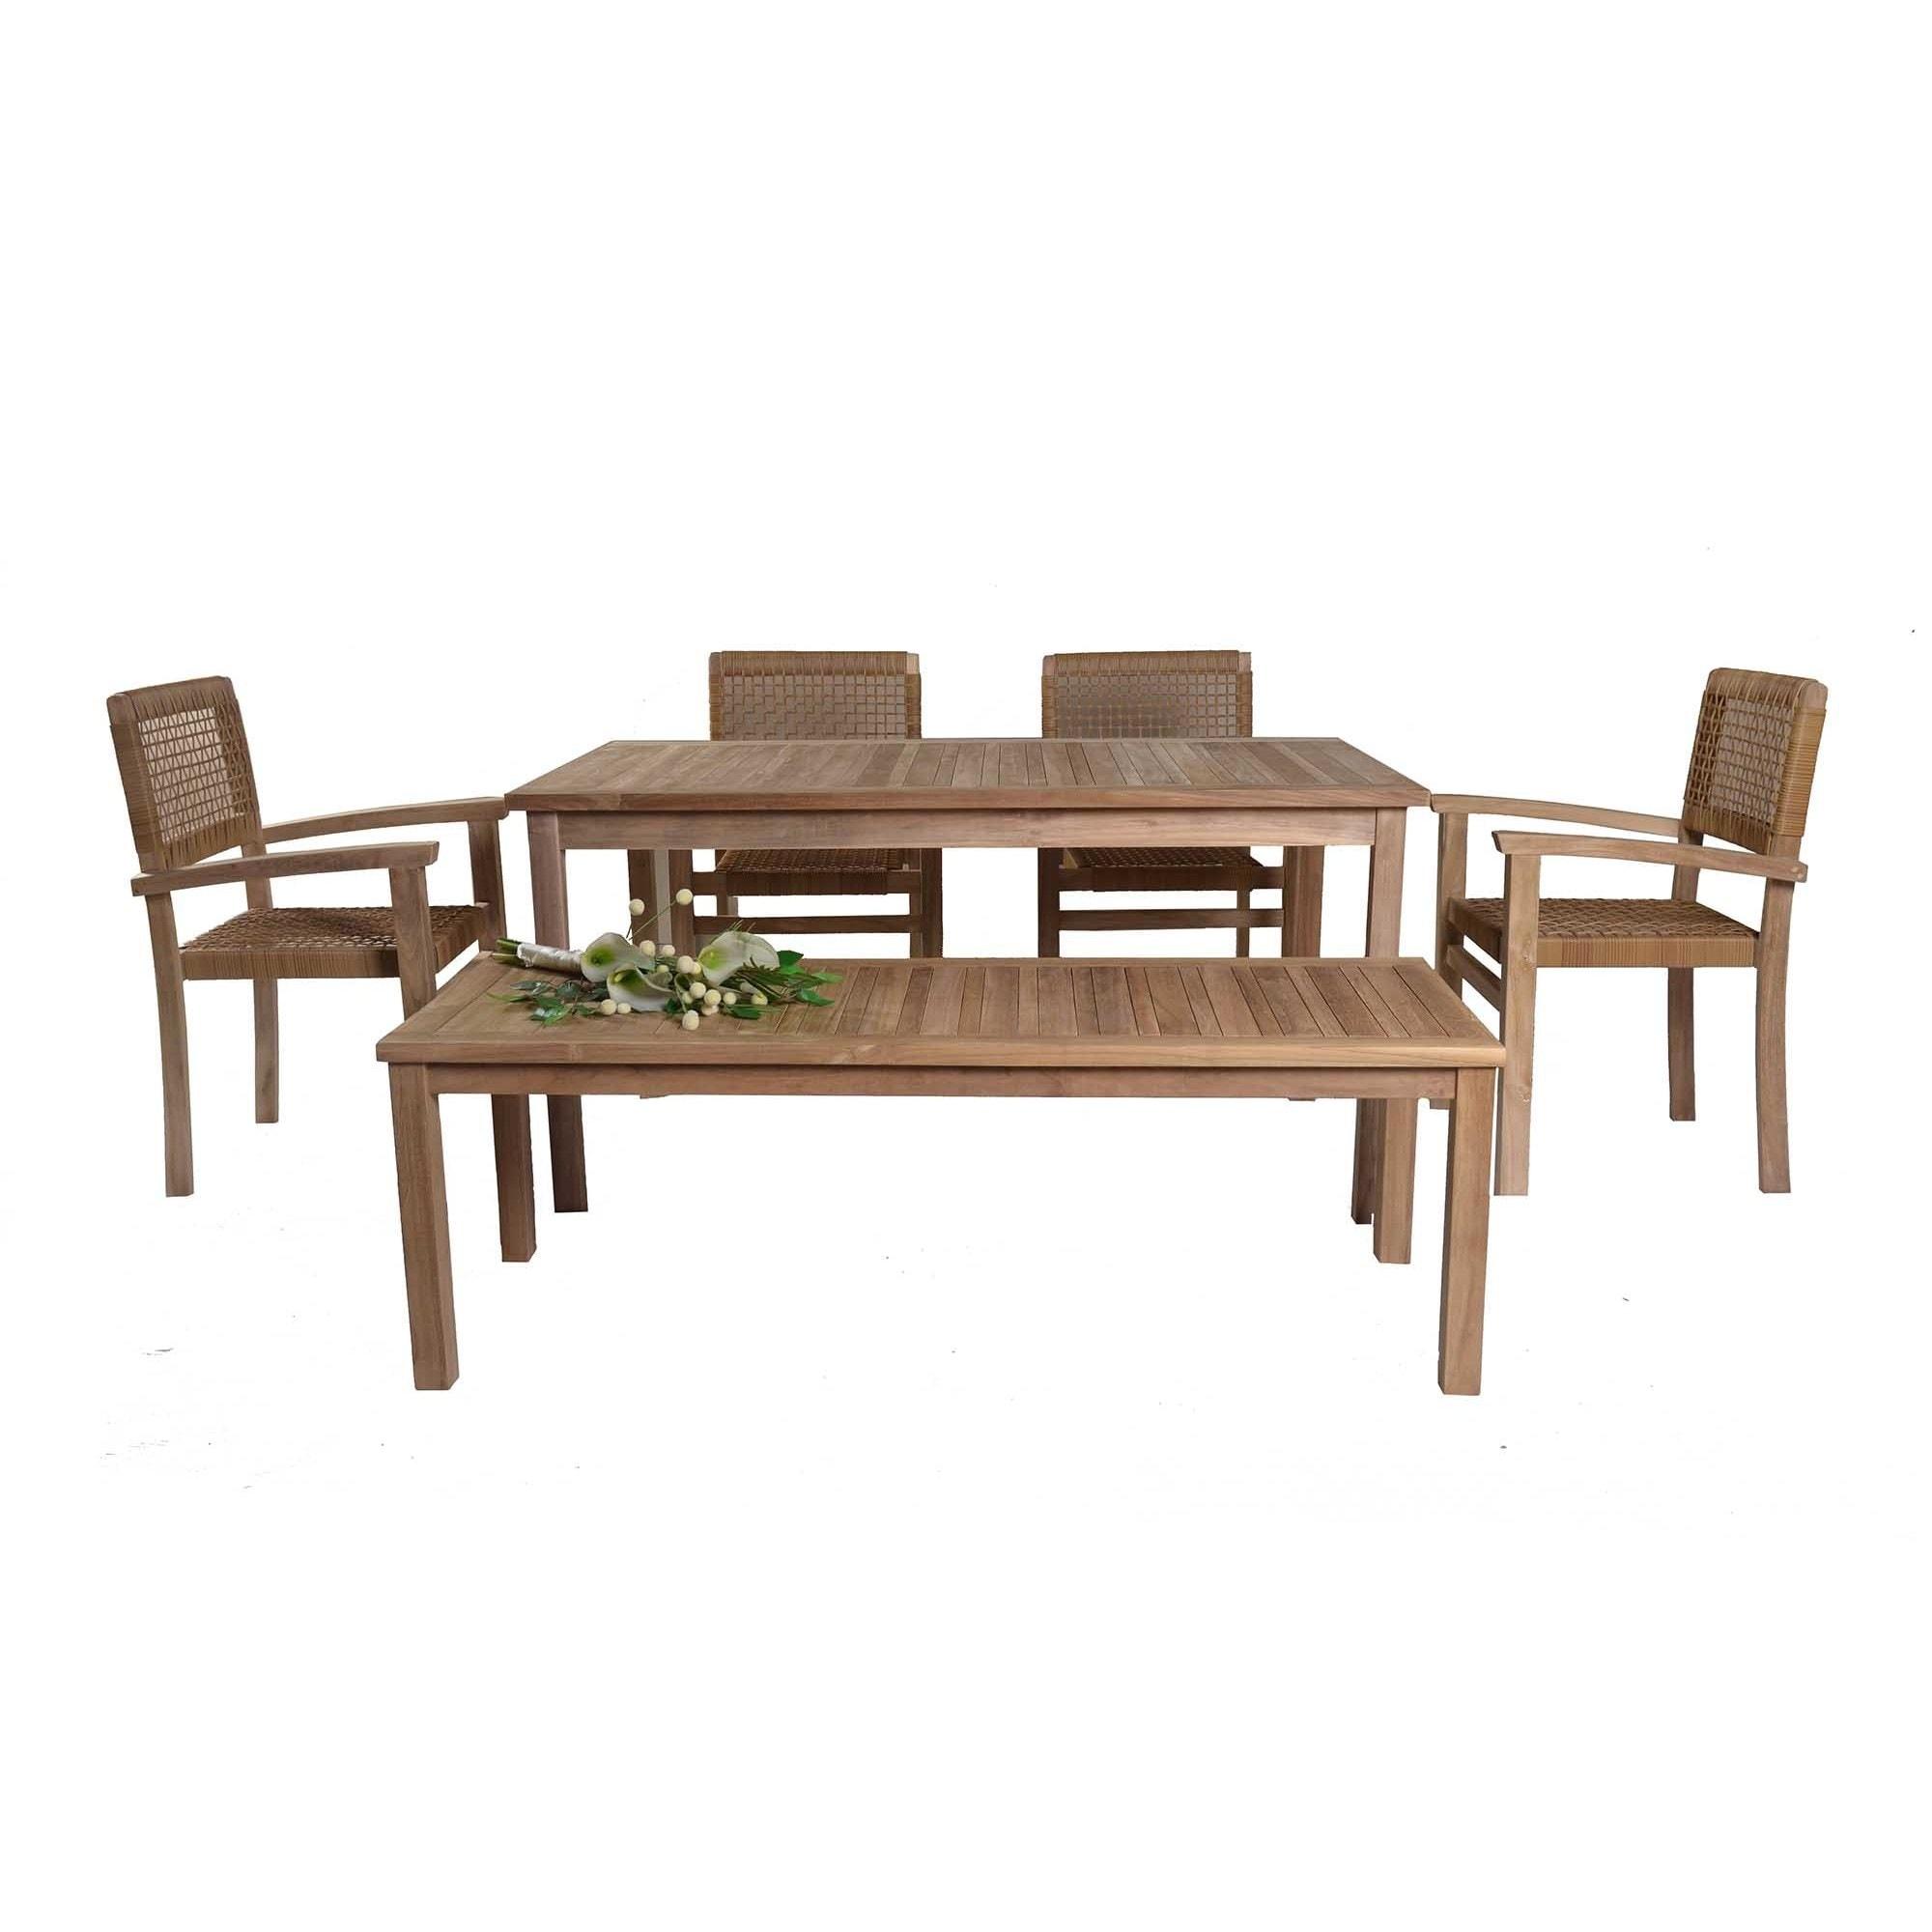 SunJoy Cebu Dining Set, Brown, Size 6-Piece Sets, Patio F...